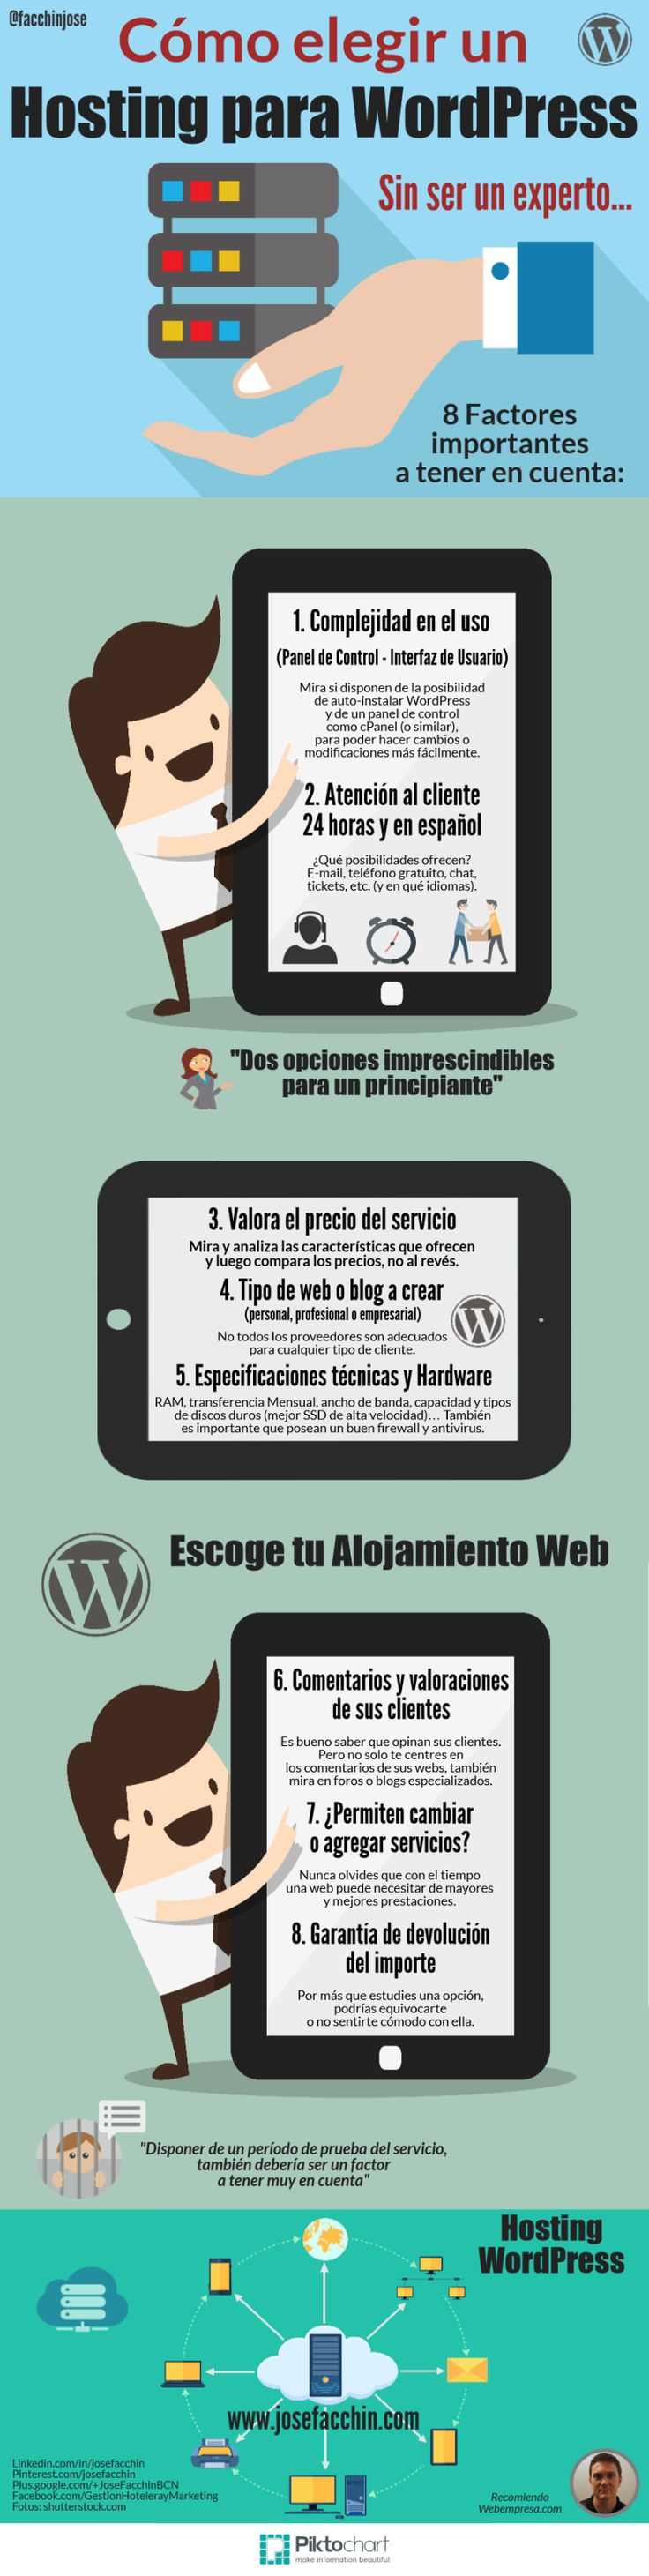 ¿Cómo elegir un Hosting para WordPress sin ser un experto? #infografia #infographic #WordPress